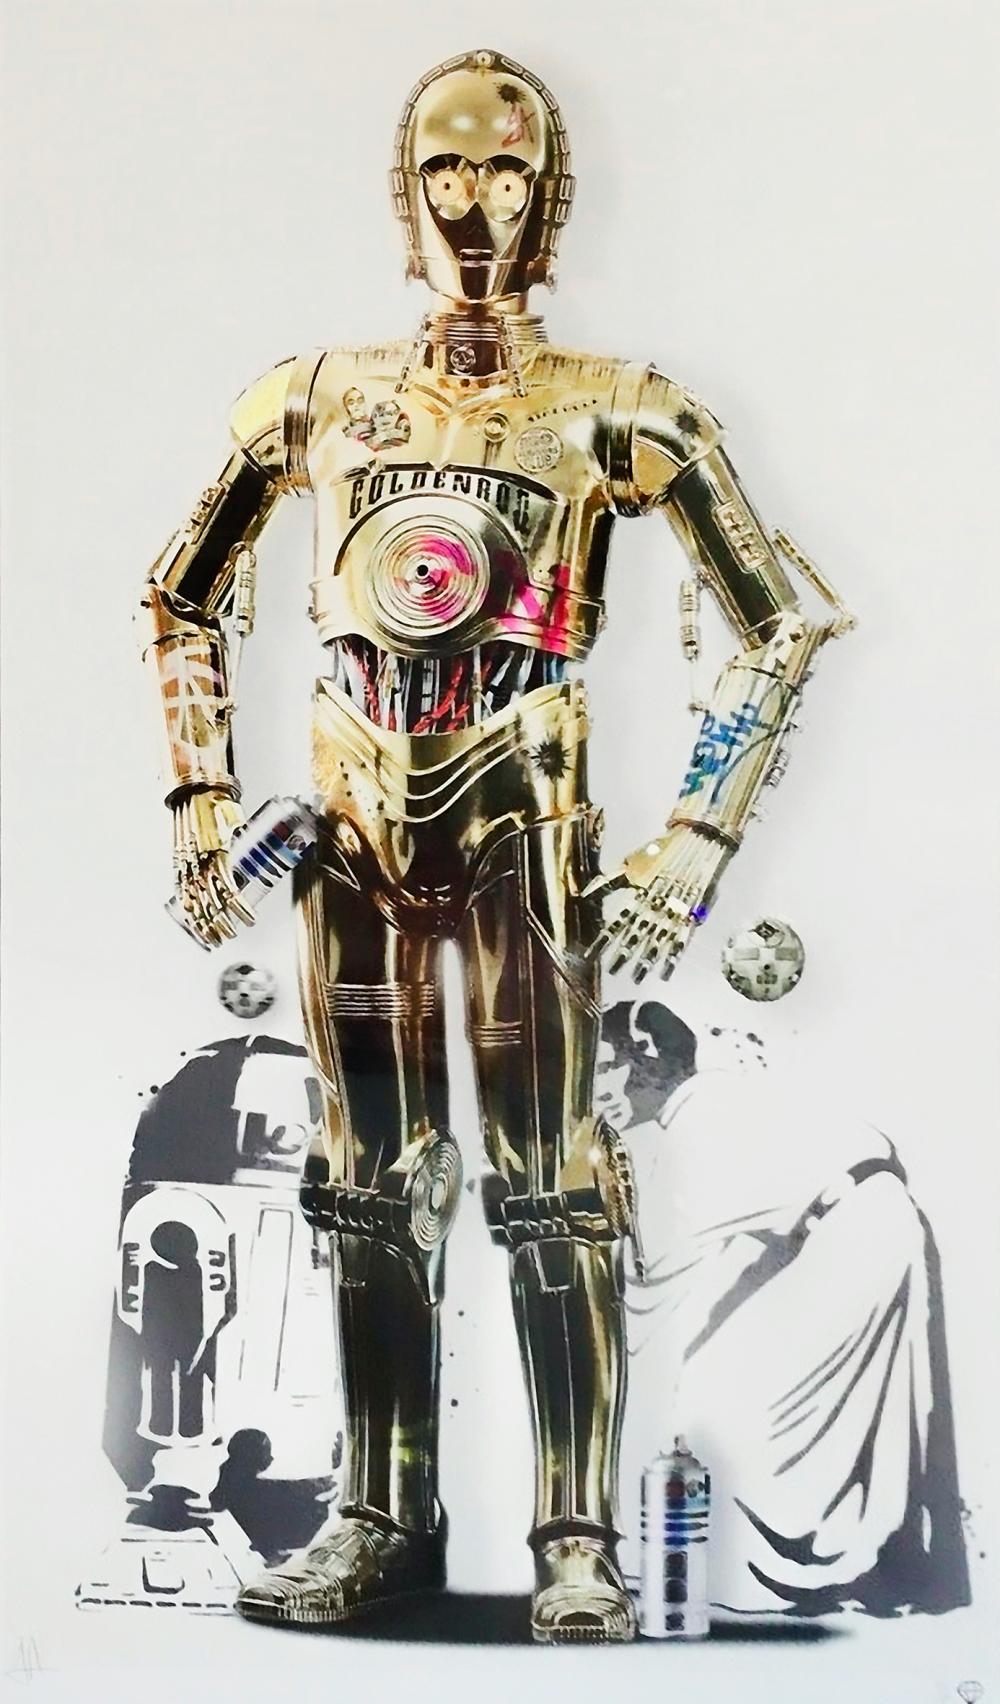 JJ Adams (British 1978-), 'Goldenrod', 2014